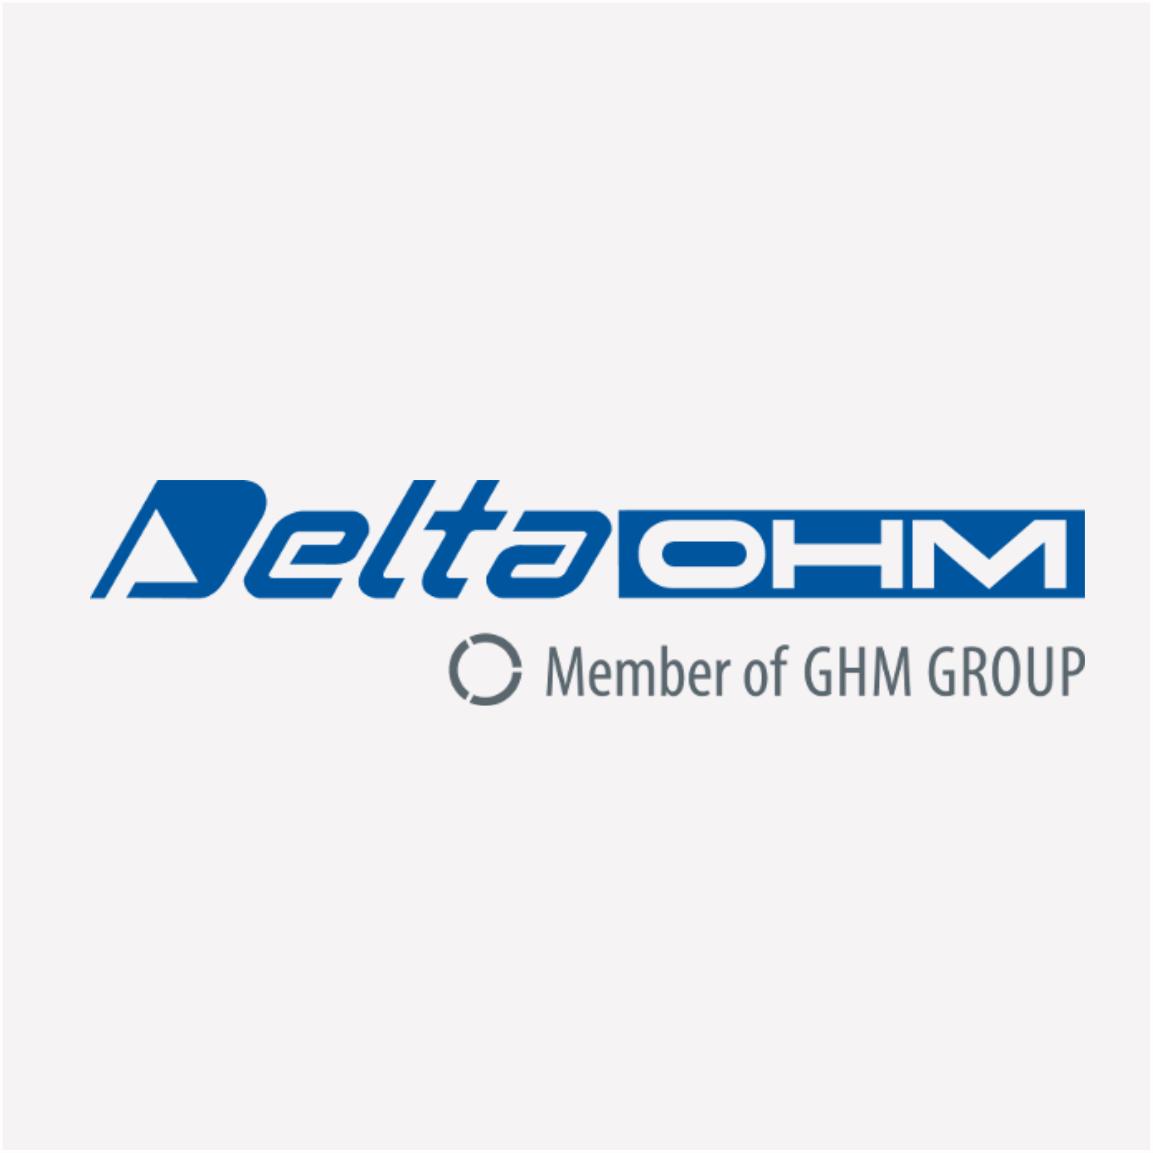 deltaohm_logo